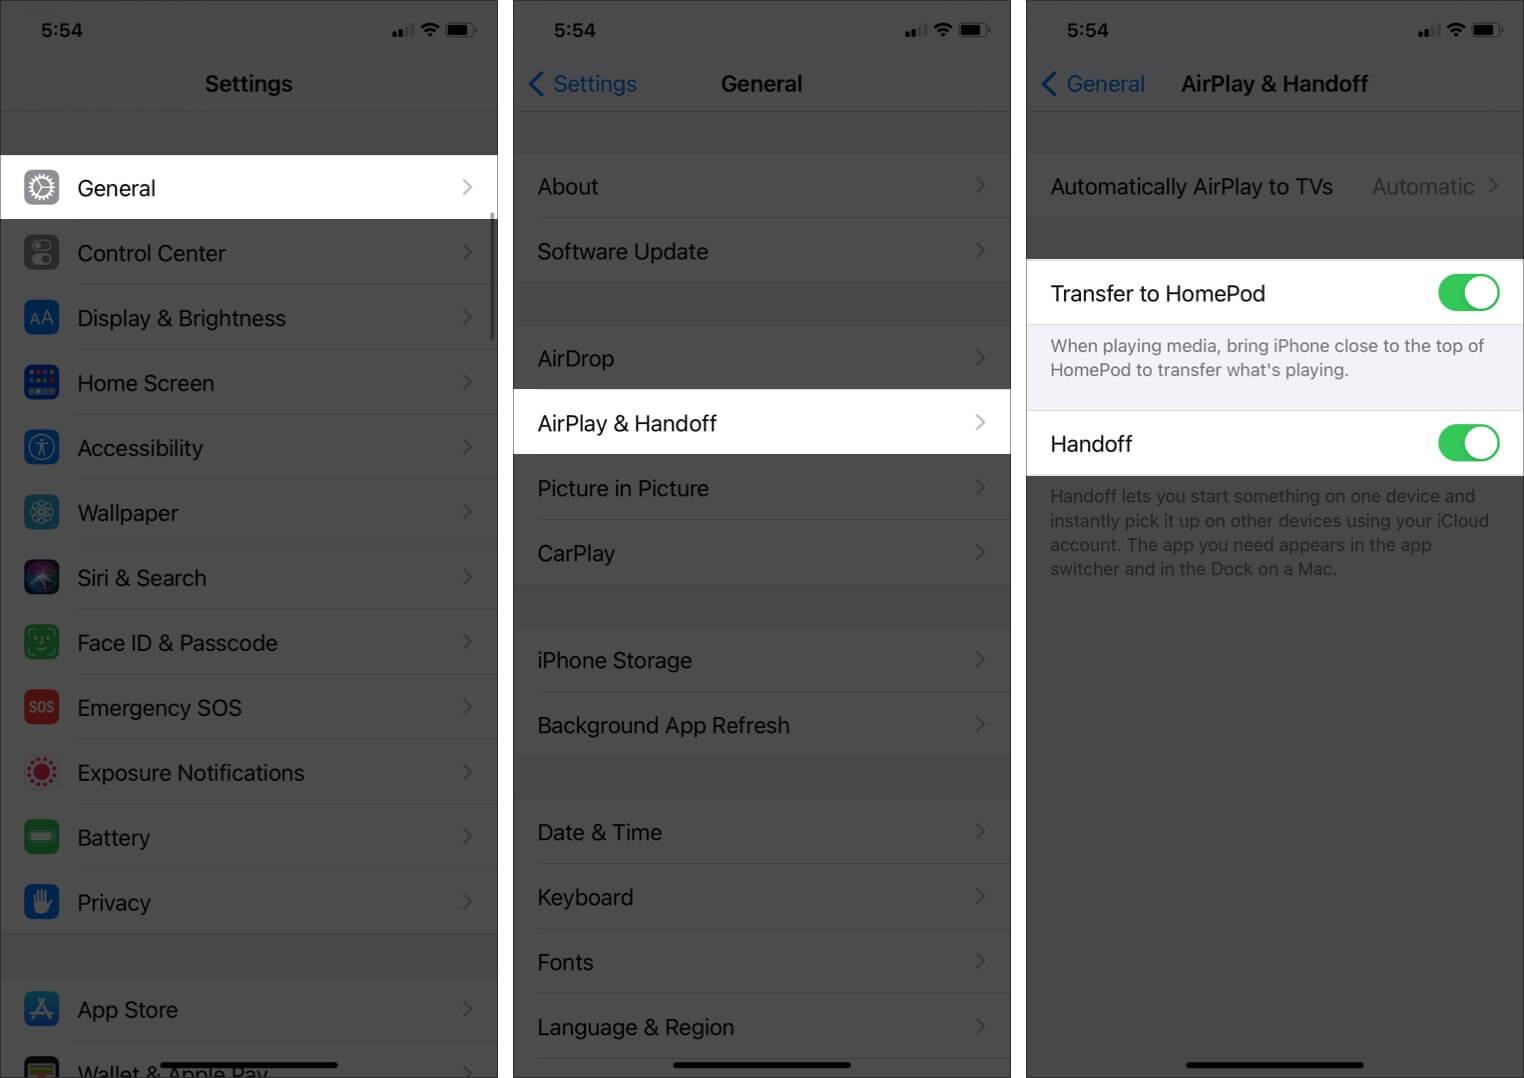 Turn On Handoff between iPhone and HomePod